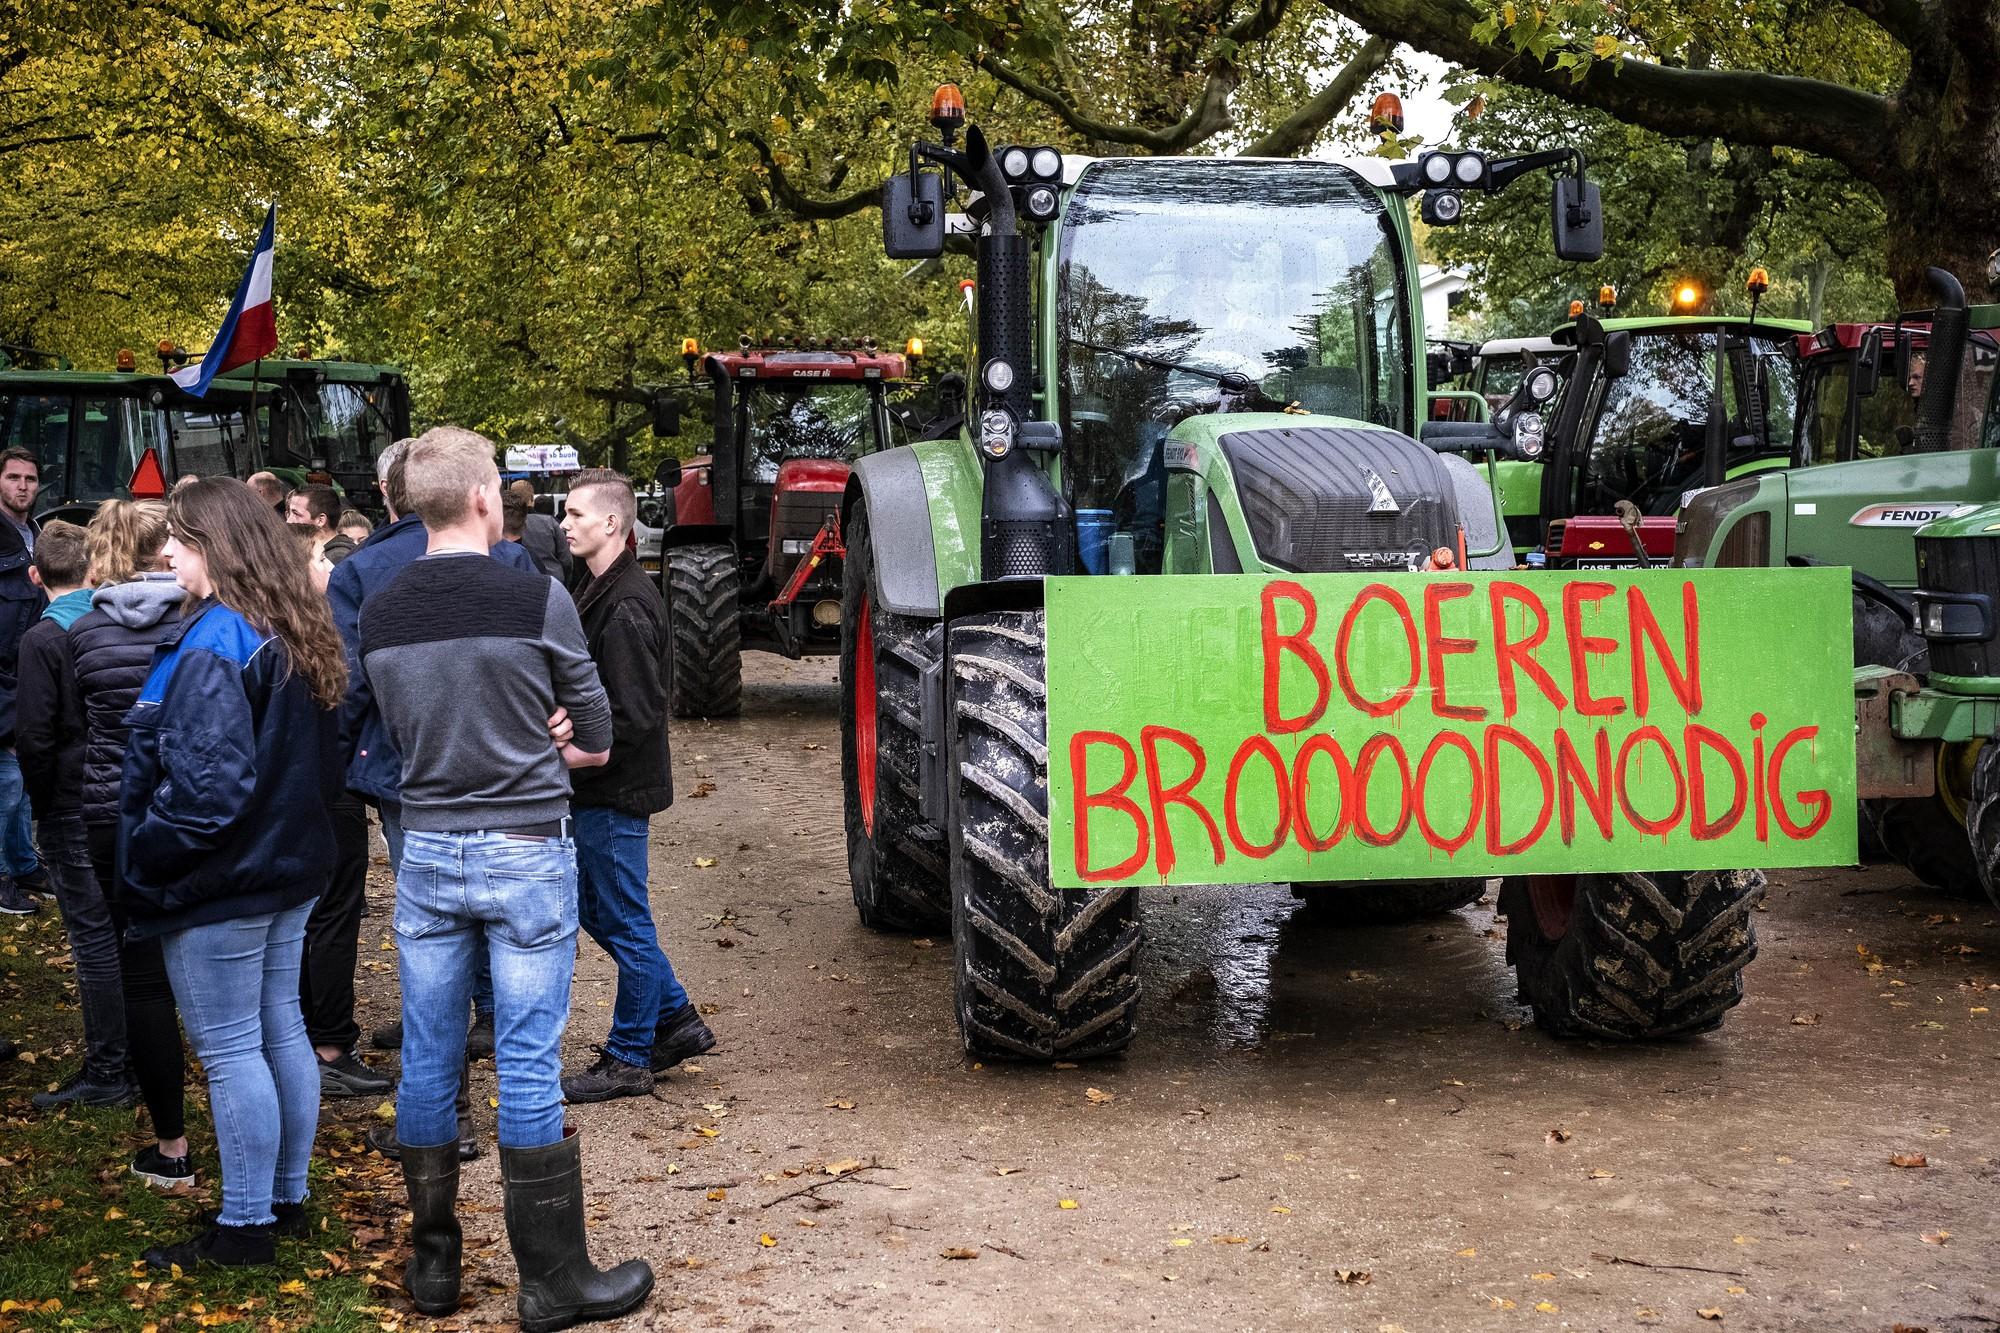 #Boerenterreur